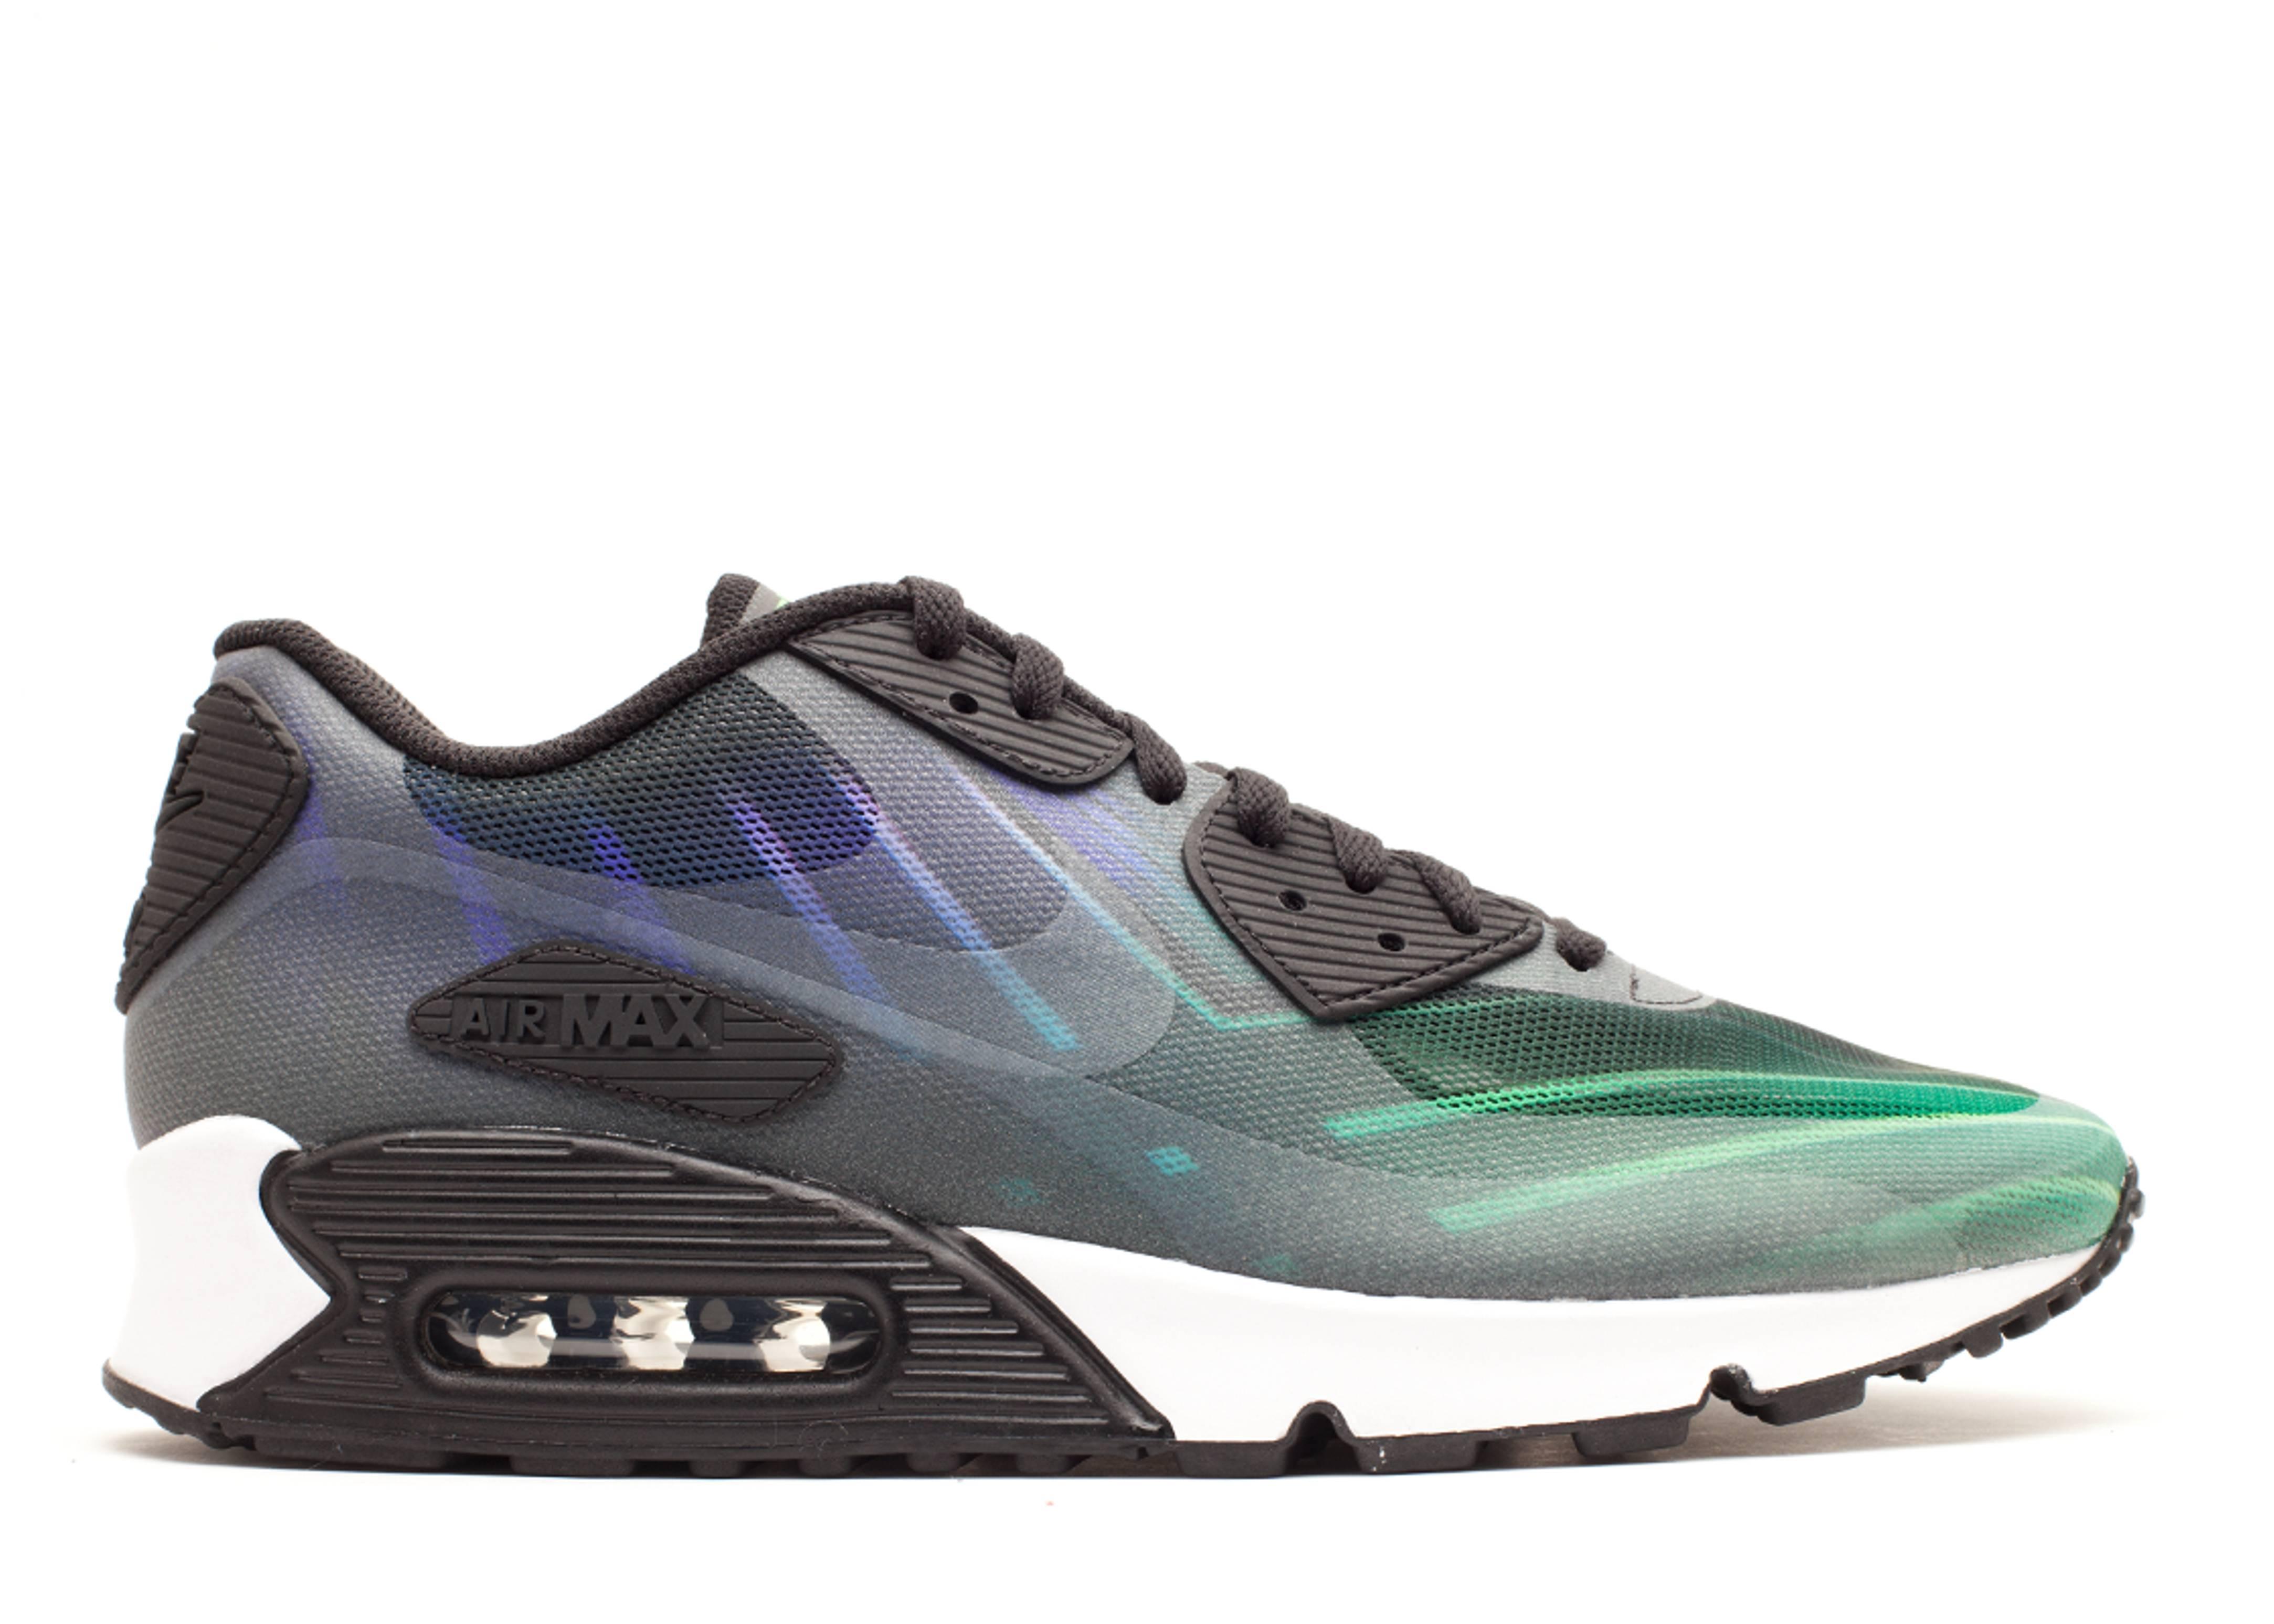 8a625696f9 Air Max 90 + Hurley - Nike - 502482 001 - black/black | Flight Club